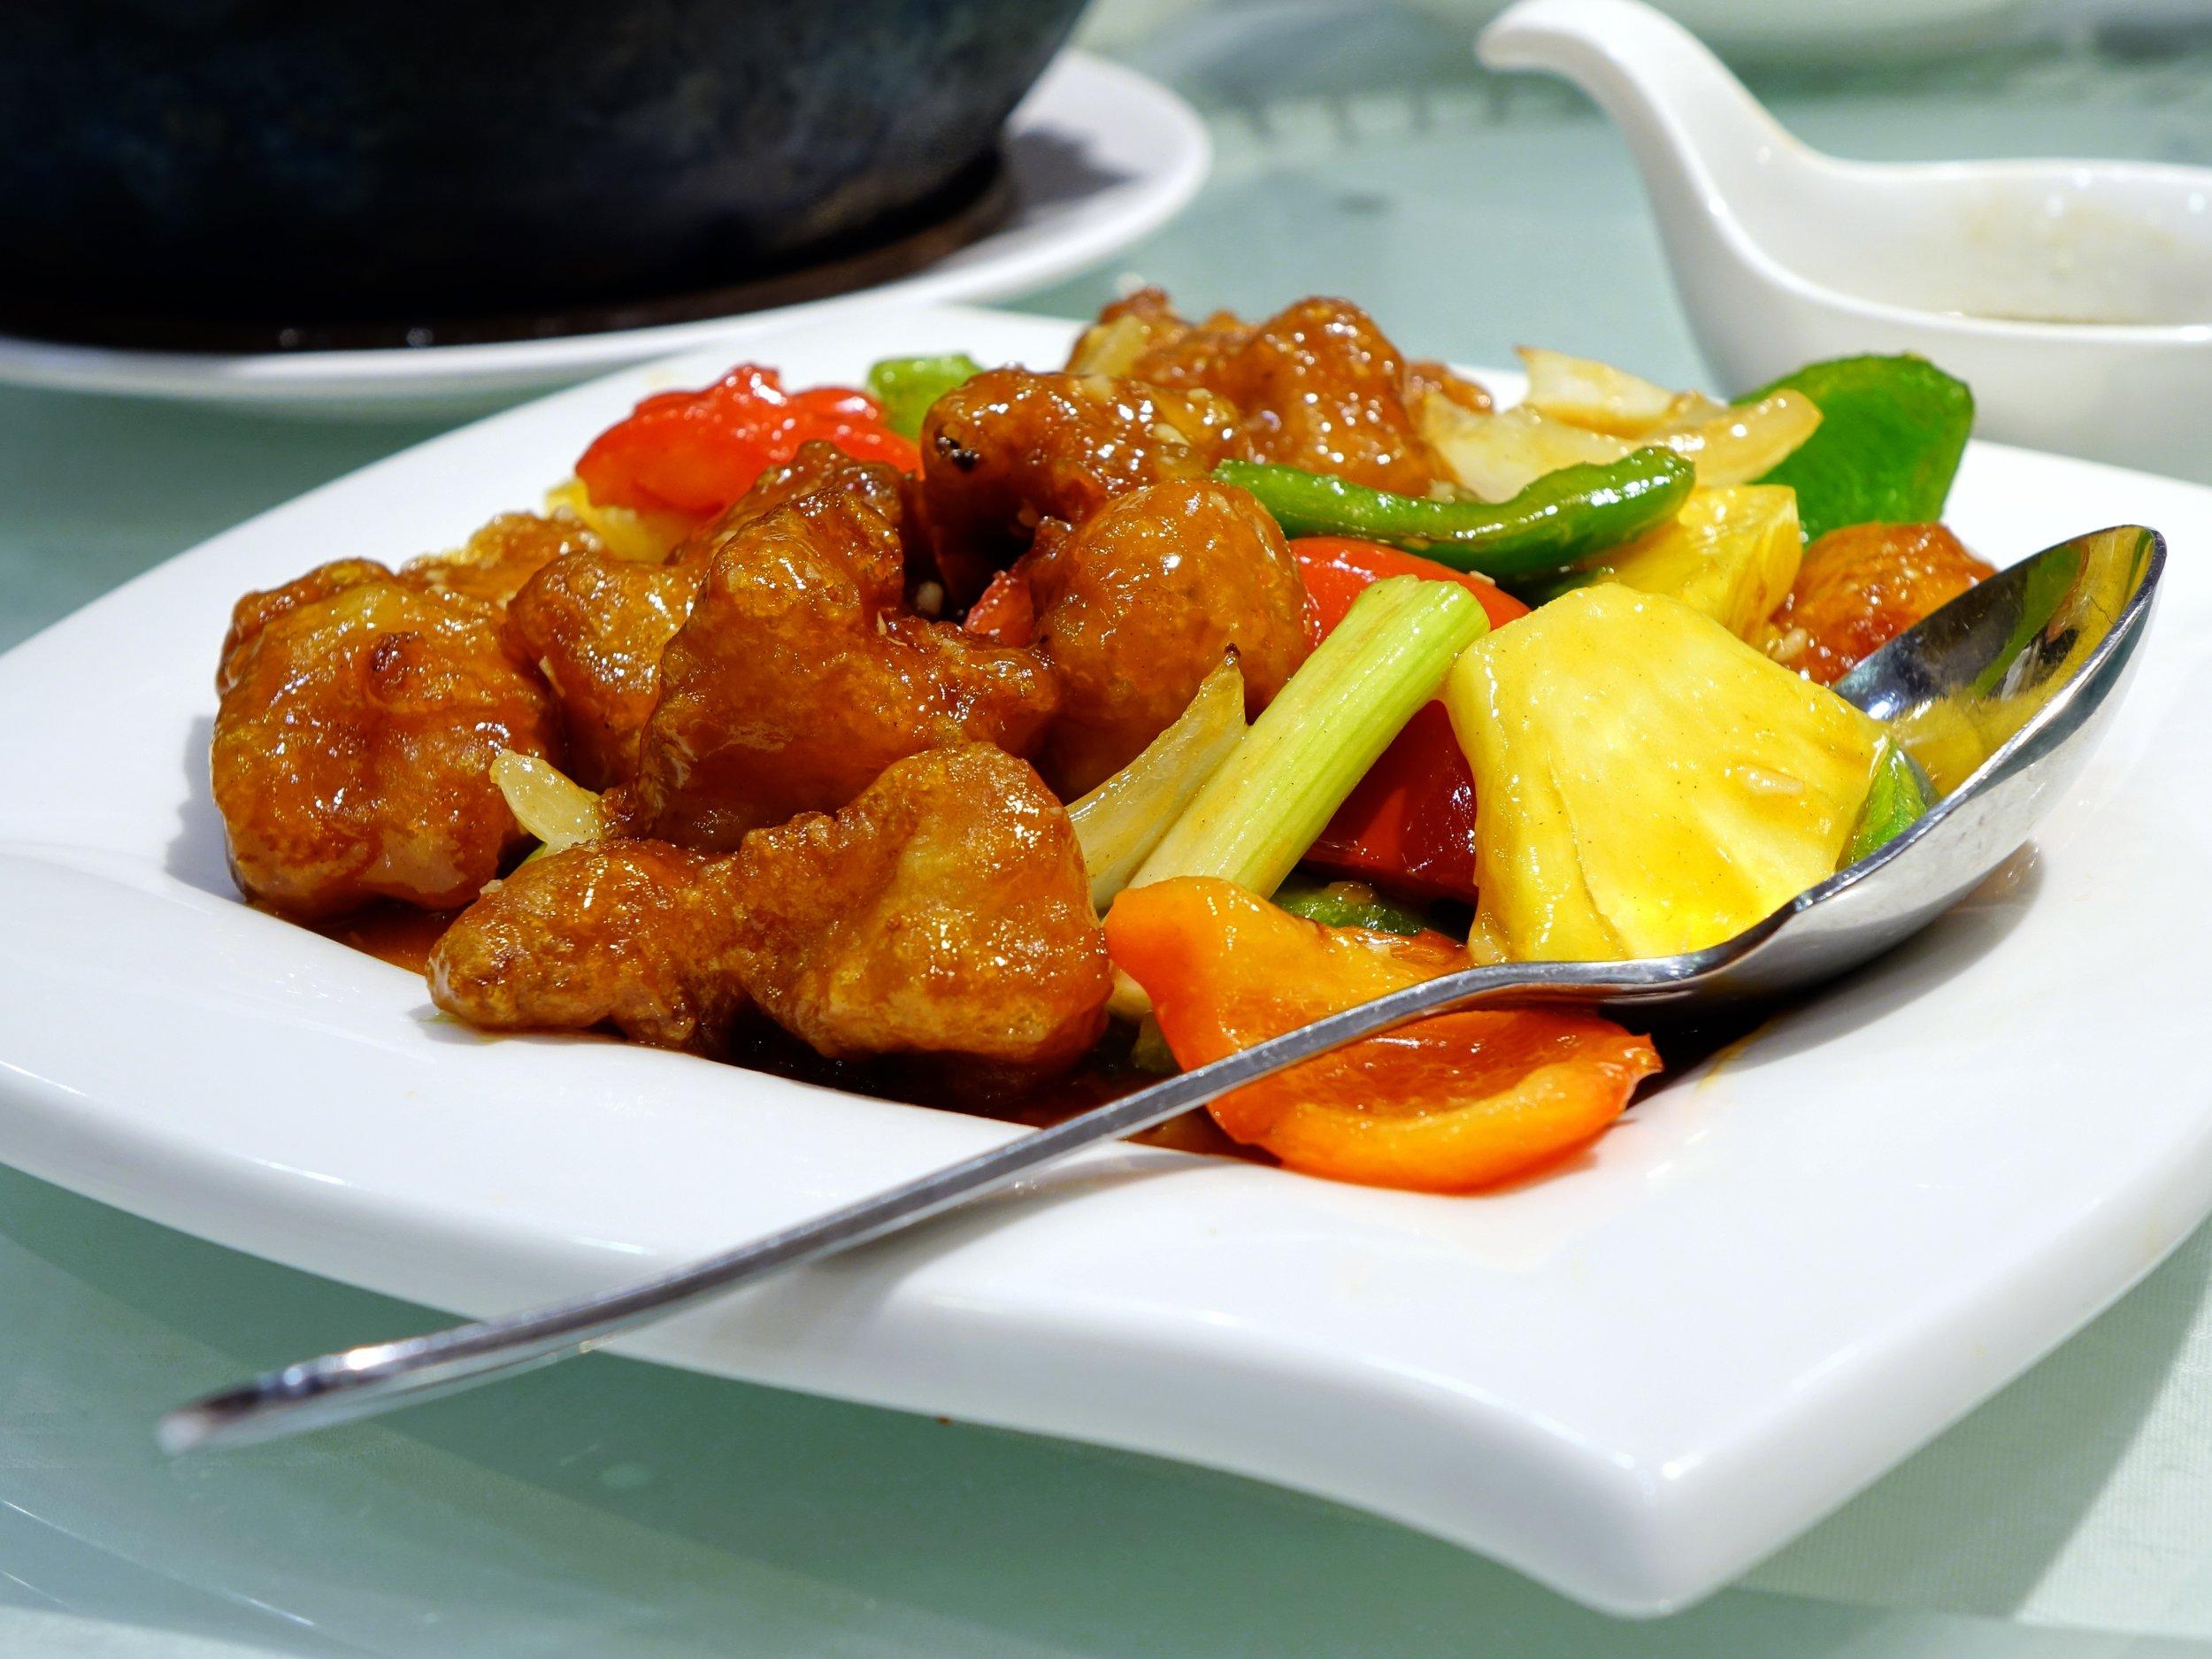 sweet-and-sour-pork-1264563.jpg